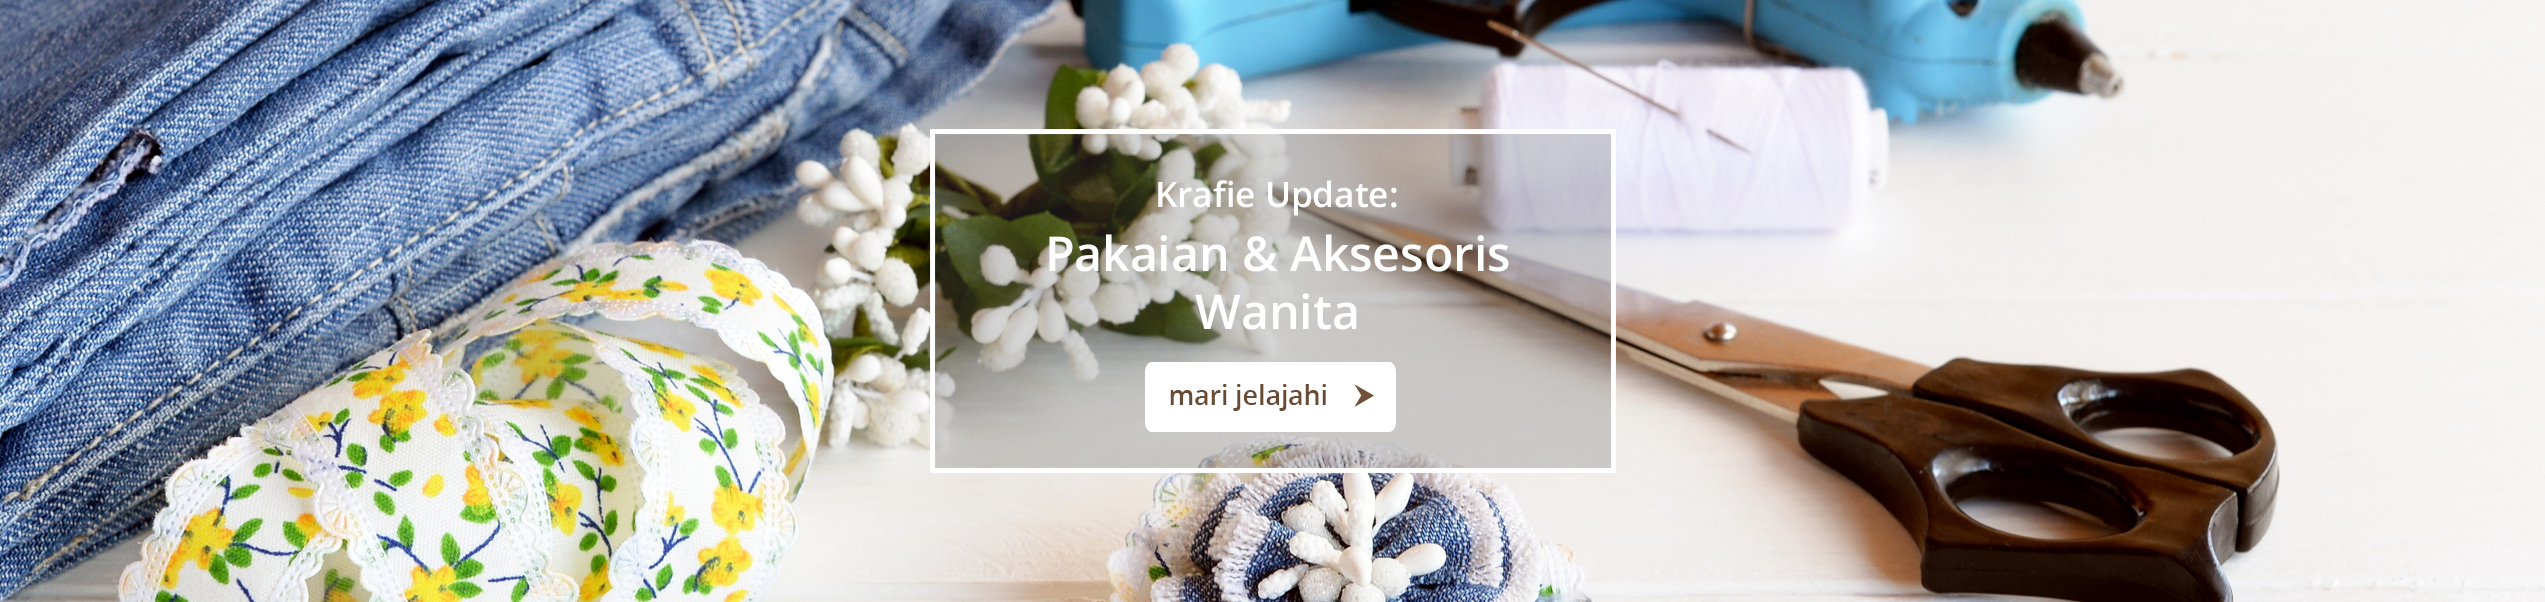 Krafie.com   fashion wanita